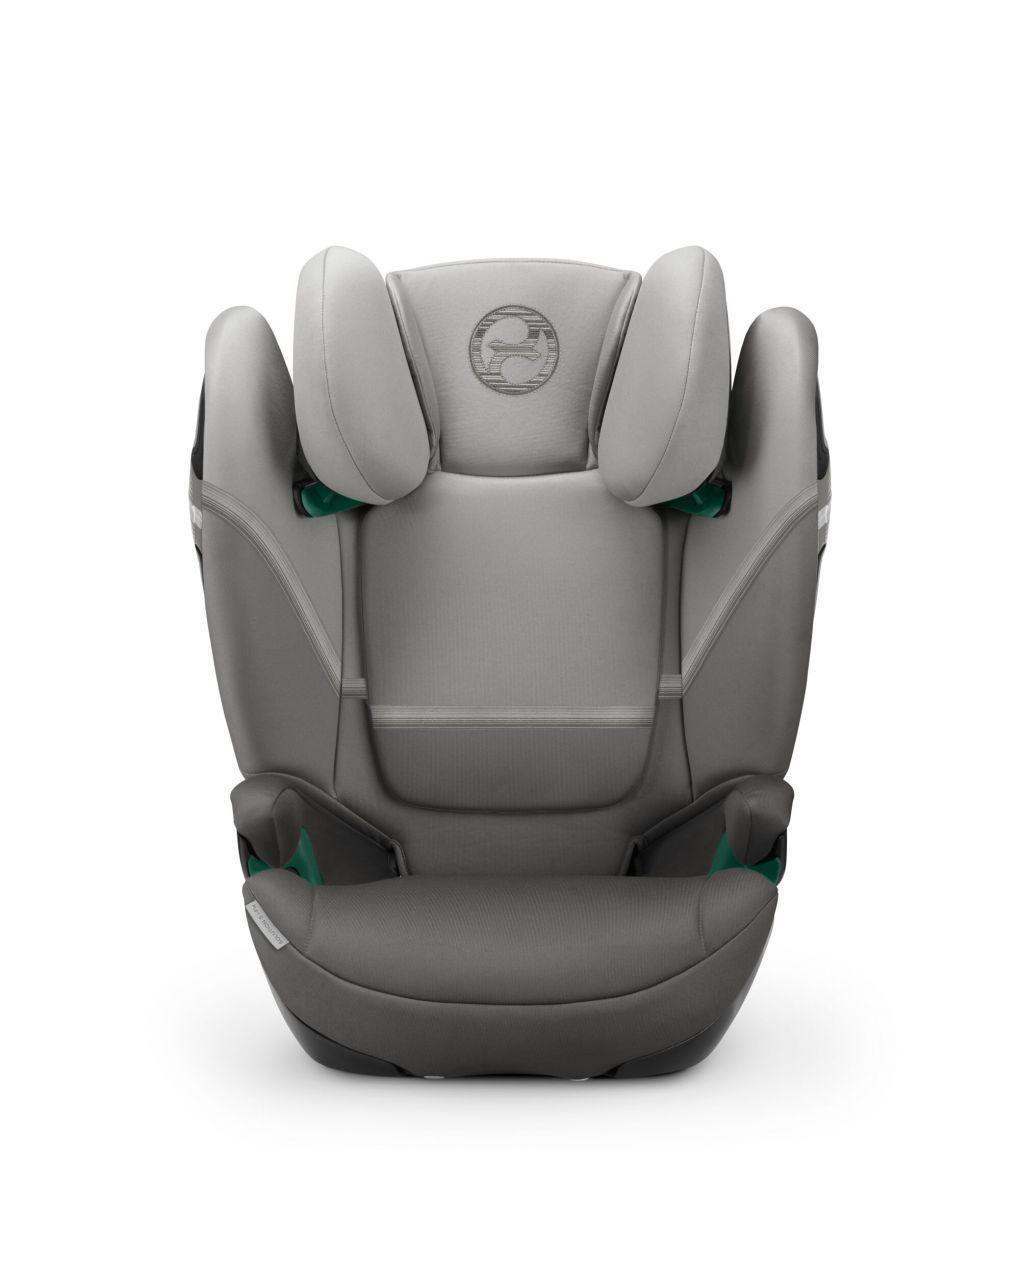 Cybex Κάθισμα Αυτοκινήτου Solution S2 i-FIX - Γκρι